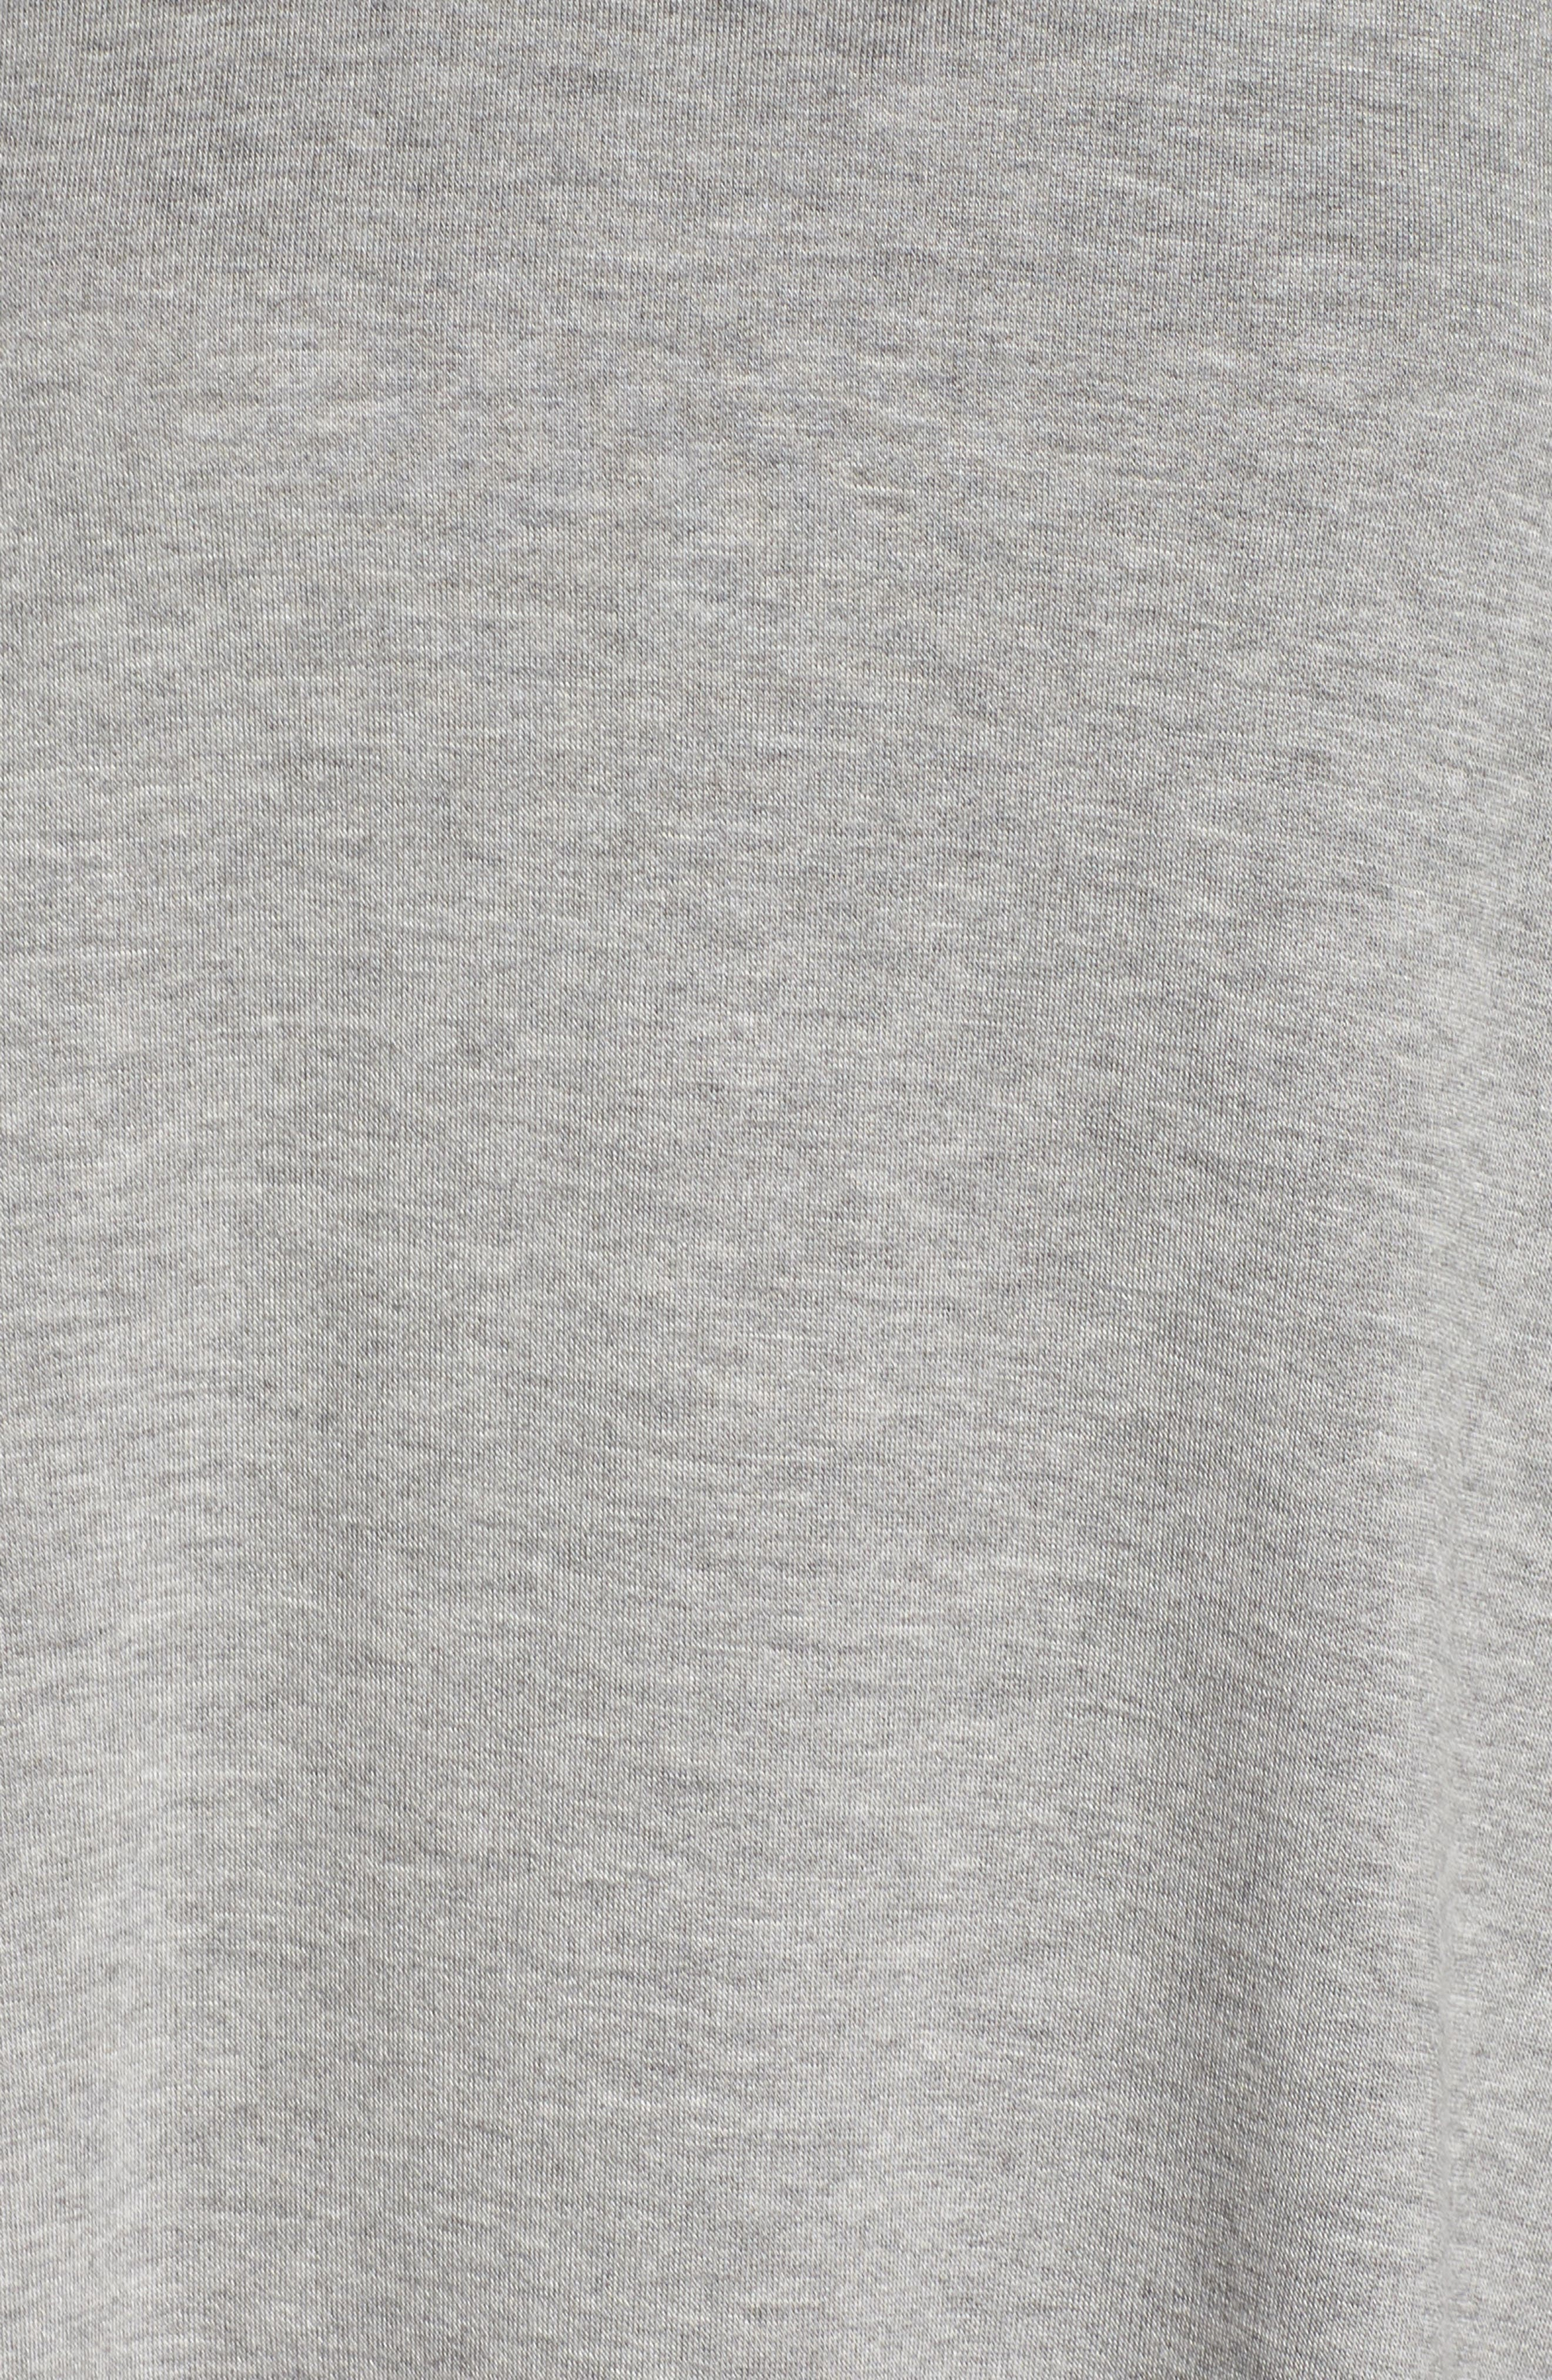 Heron Mesh Back Sweatshirt,                             Alternate thumbnail 6, color,                             HEATHER GREY